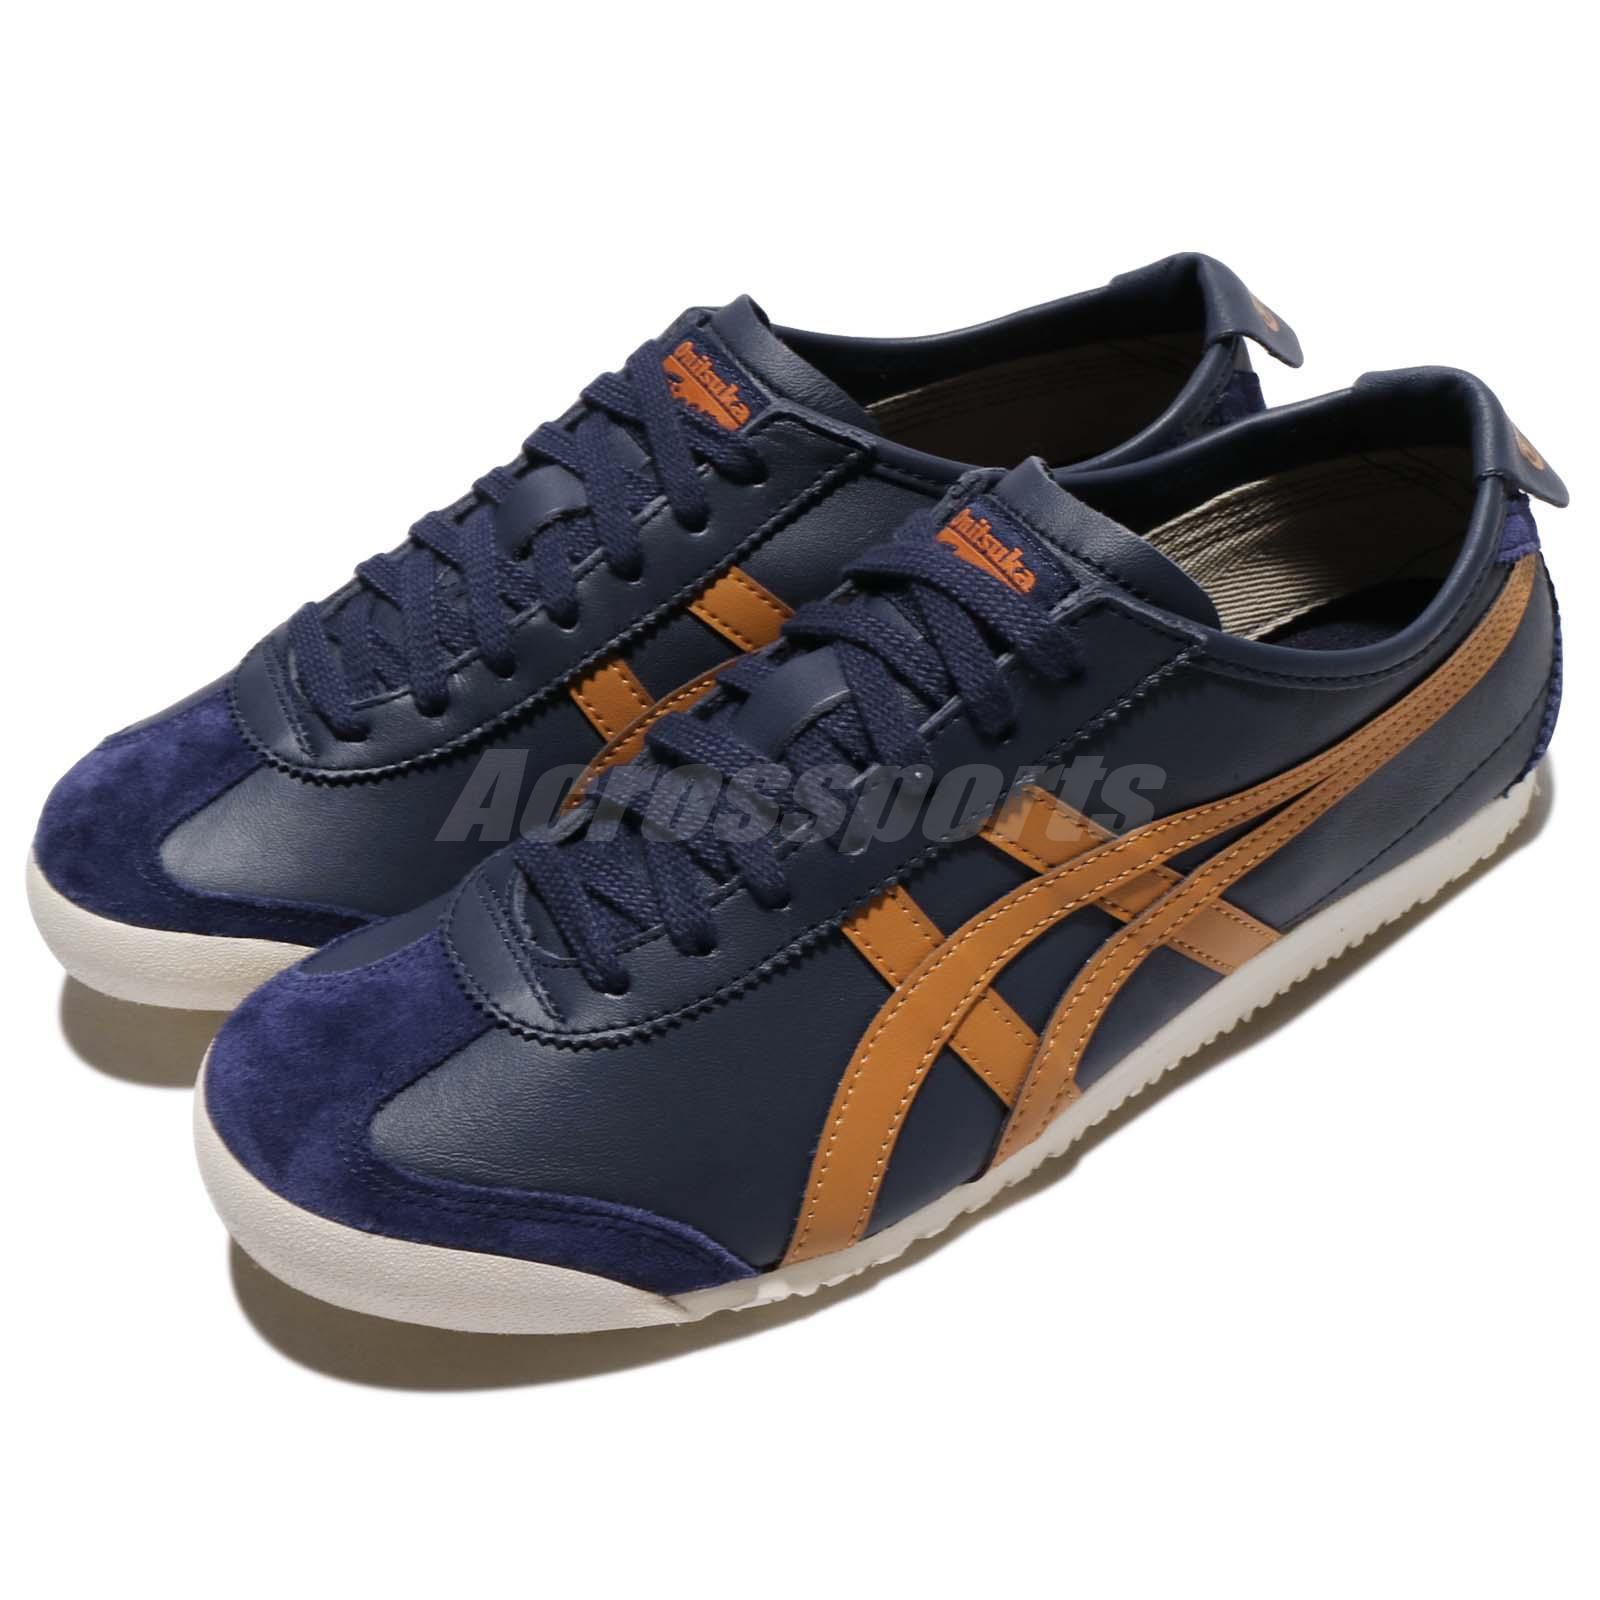 1a5e57586b Details about Asics Onitsuka Tiger Mexico 66 Peacoat Honey Ginger Men  Vintage Shoes D4J2L-5831